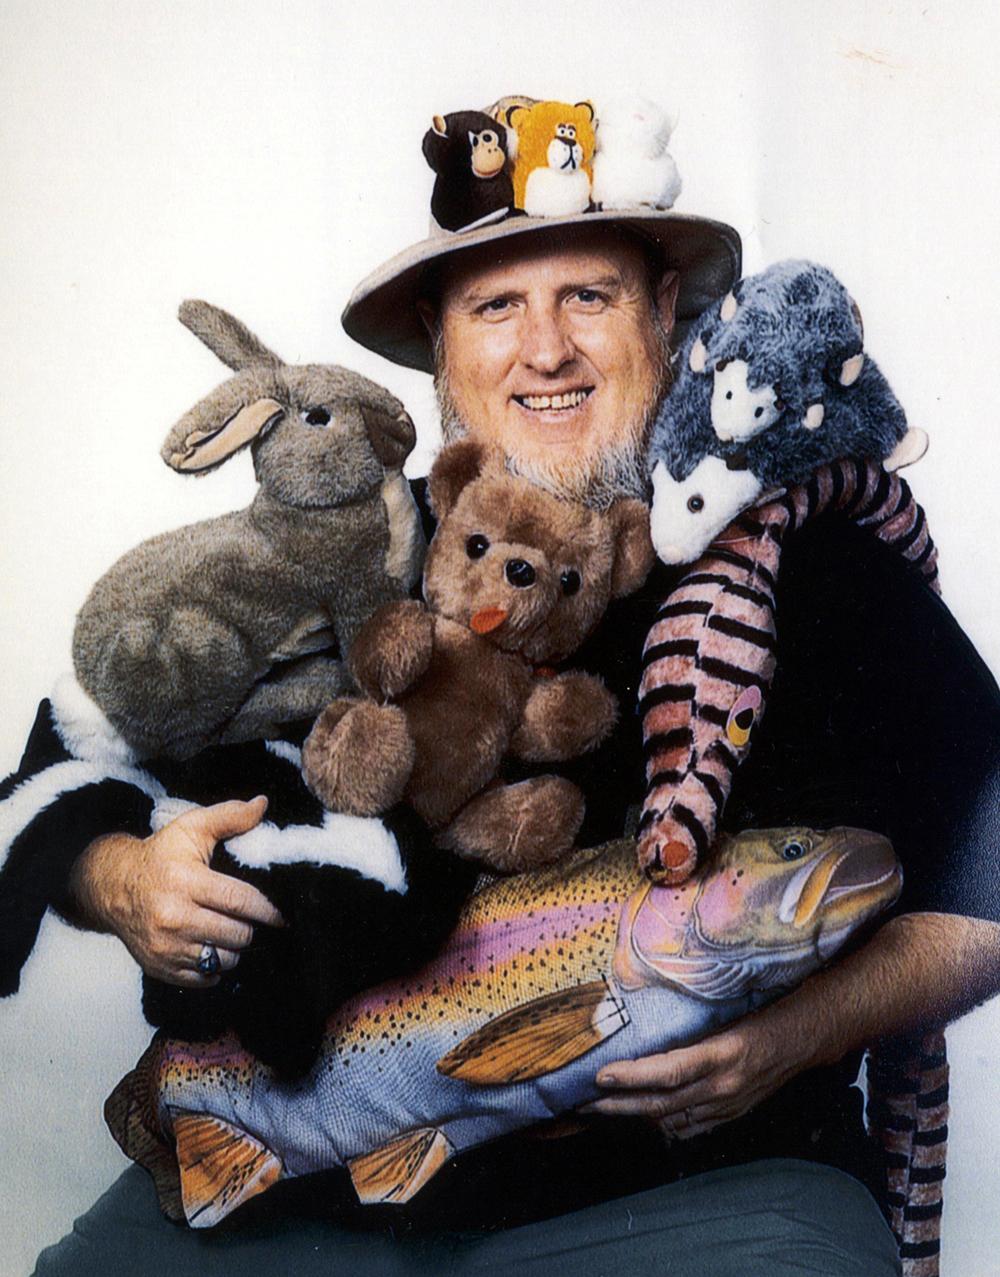 David Stokes and stuffed animal friends